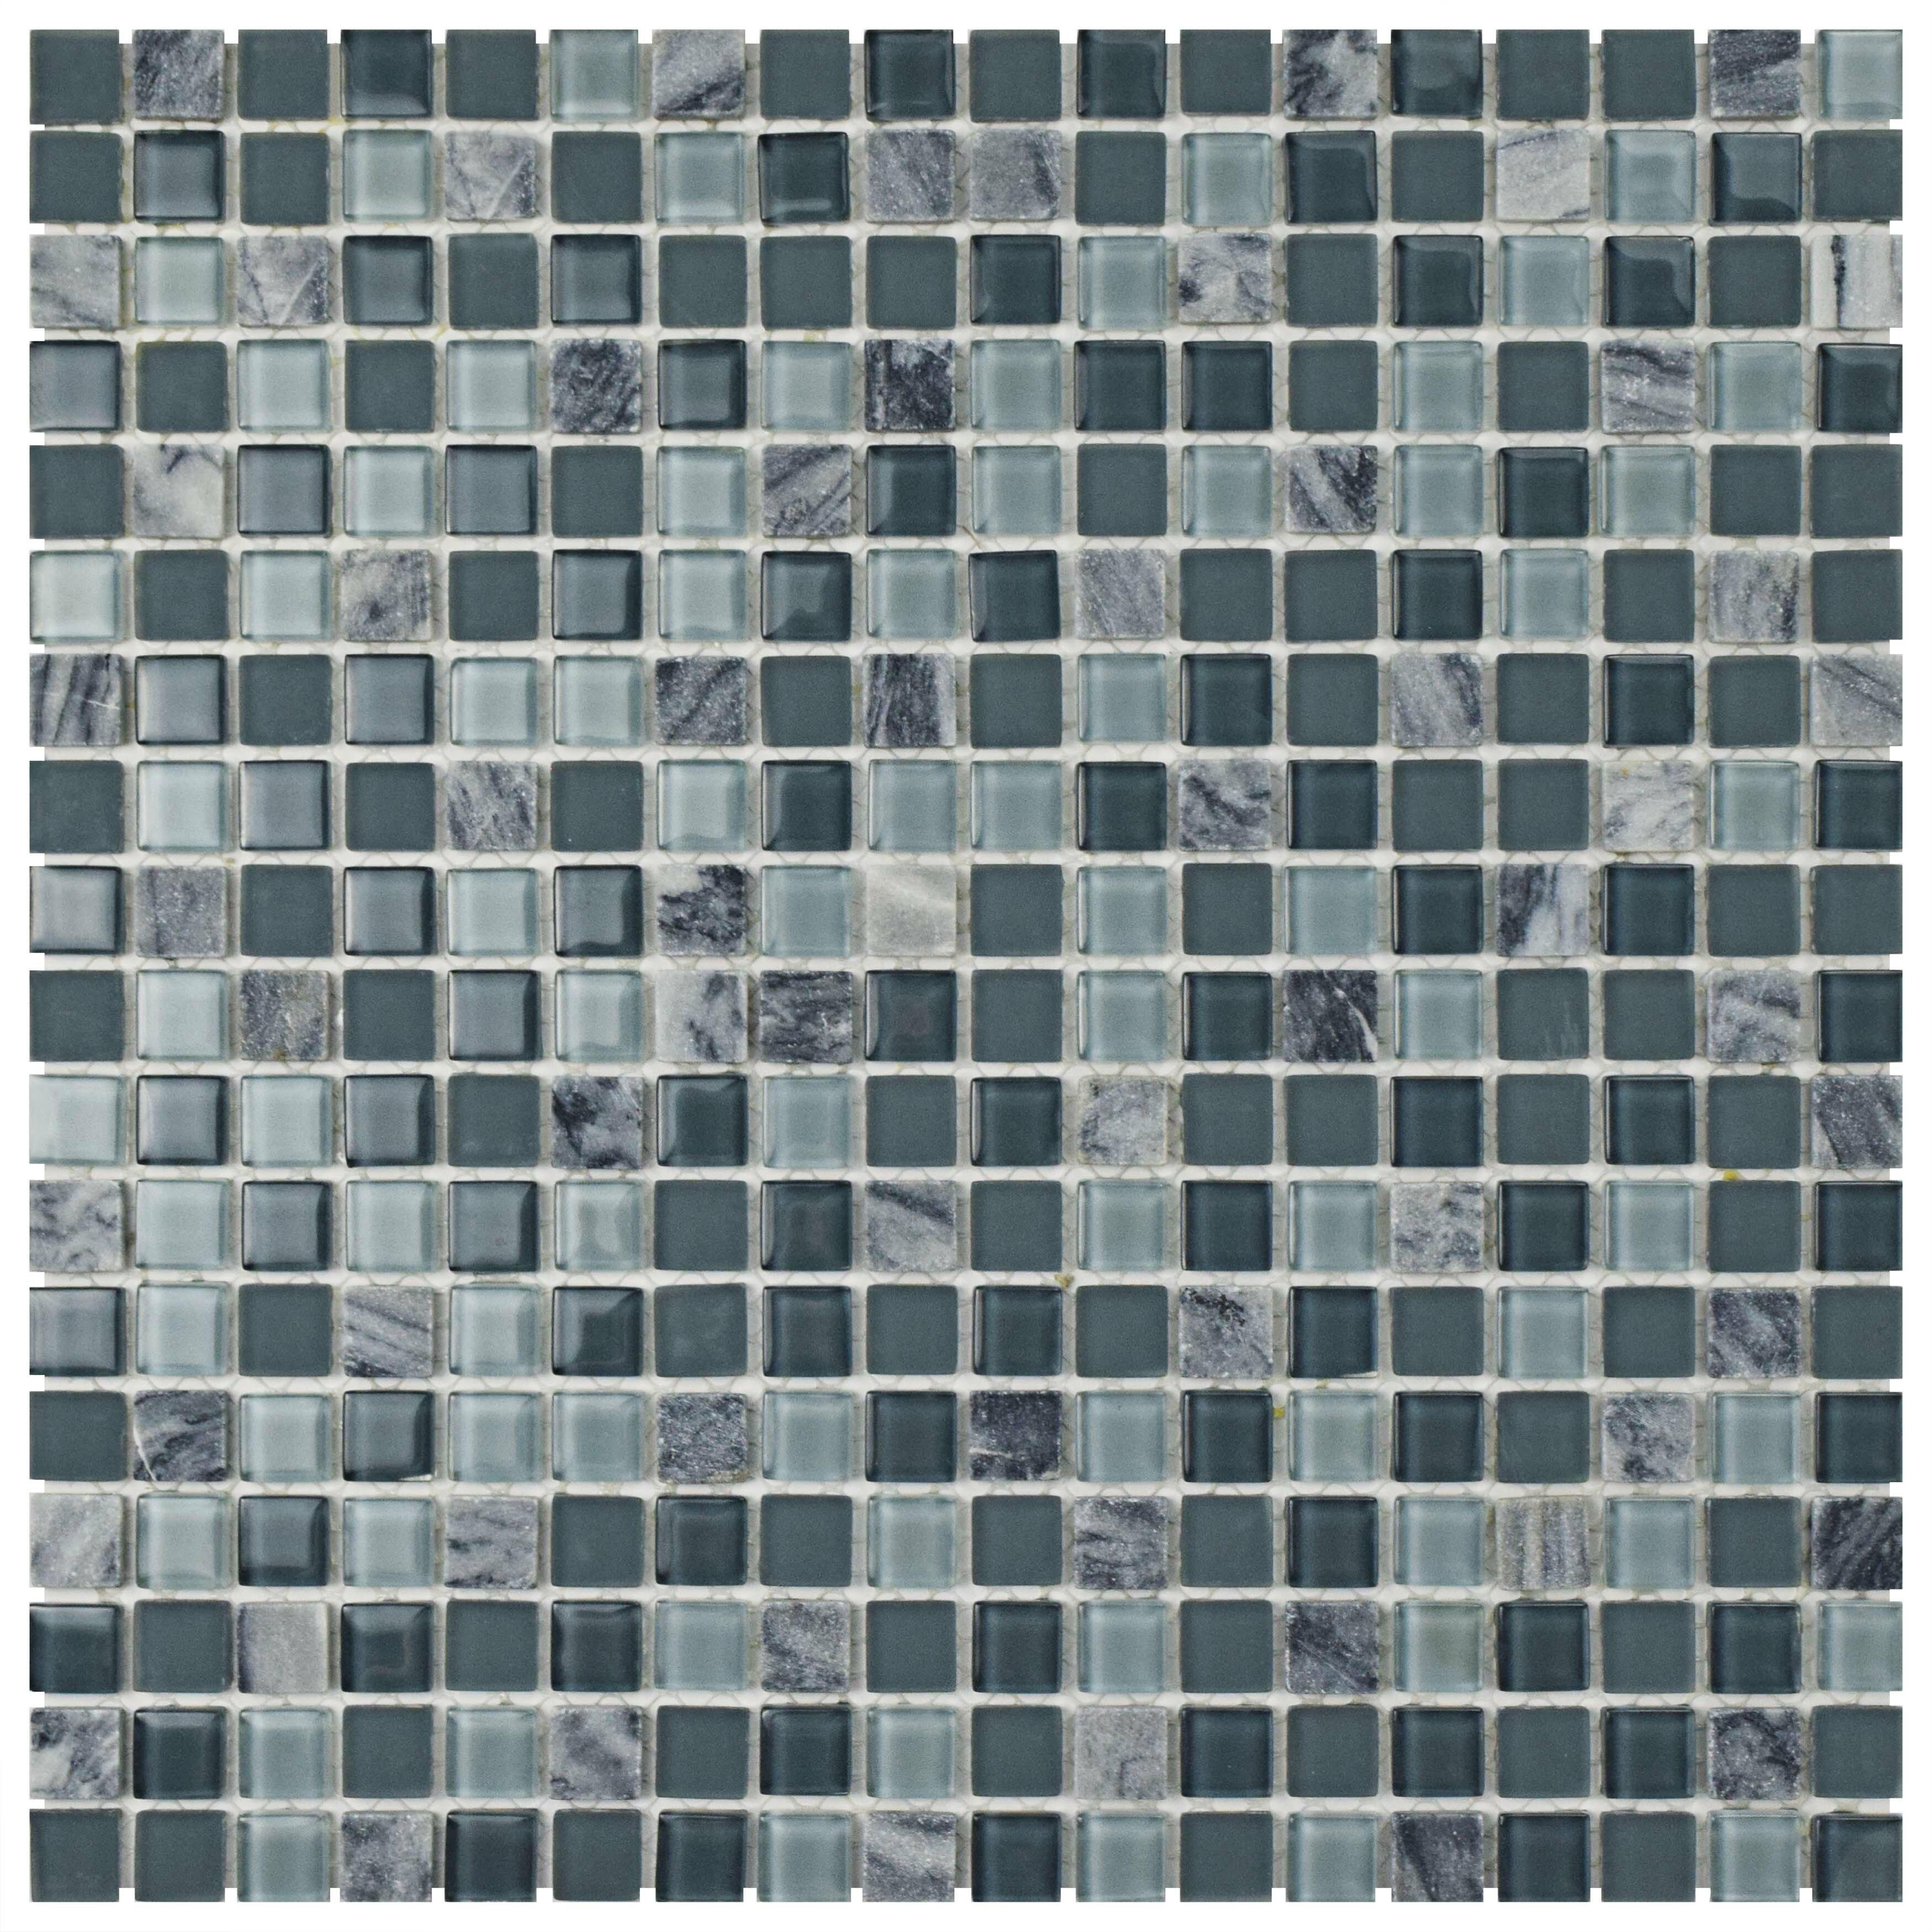 EliteTile Ambit Glass/Natural Stone Mosaic Tile in Fortress | Wayfair